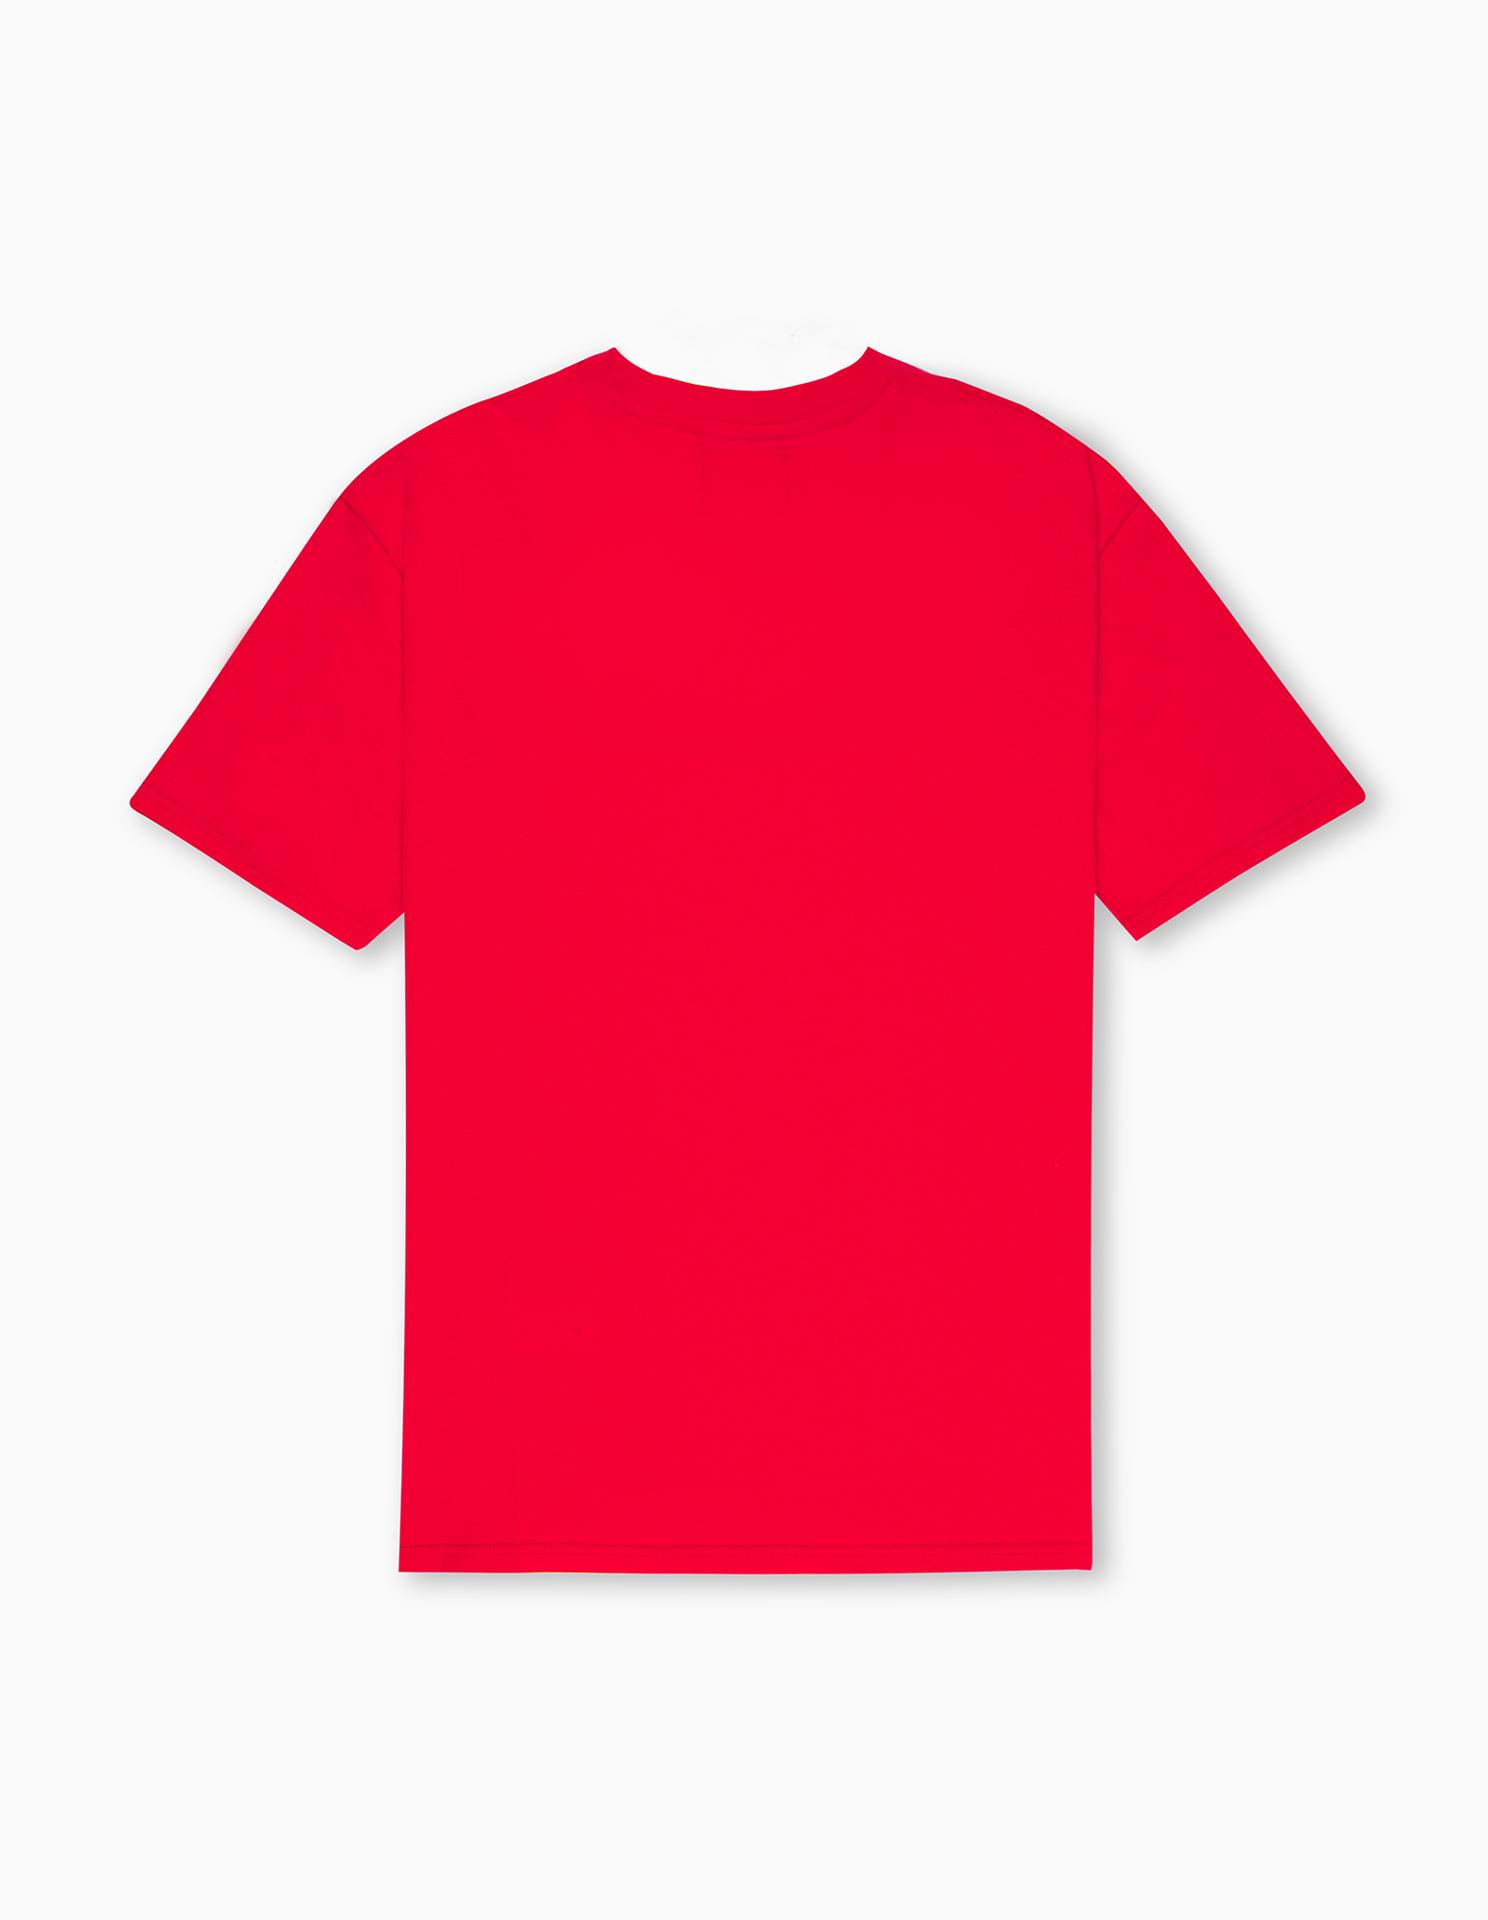 【PAS DE MER/パドゥメ】SUBURB T-SHIRT Tシャツ / RED BERRY